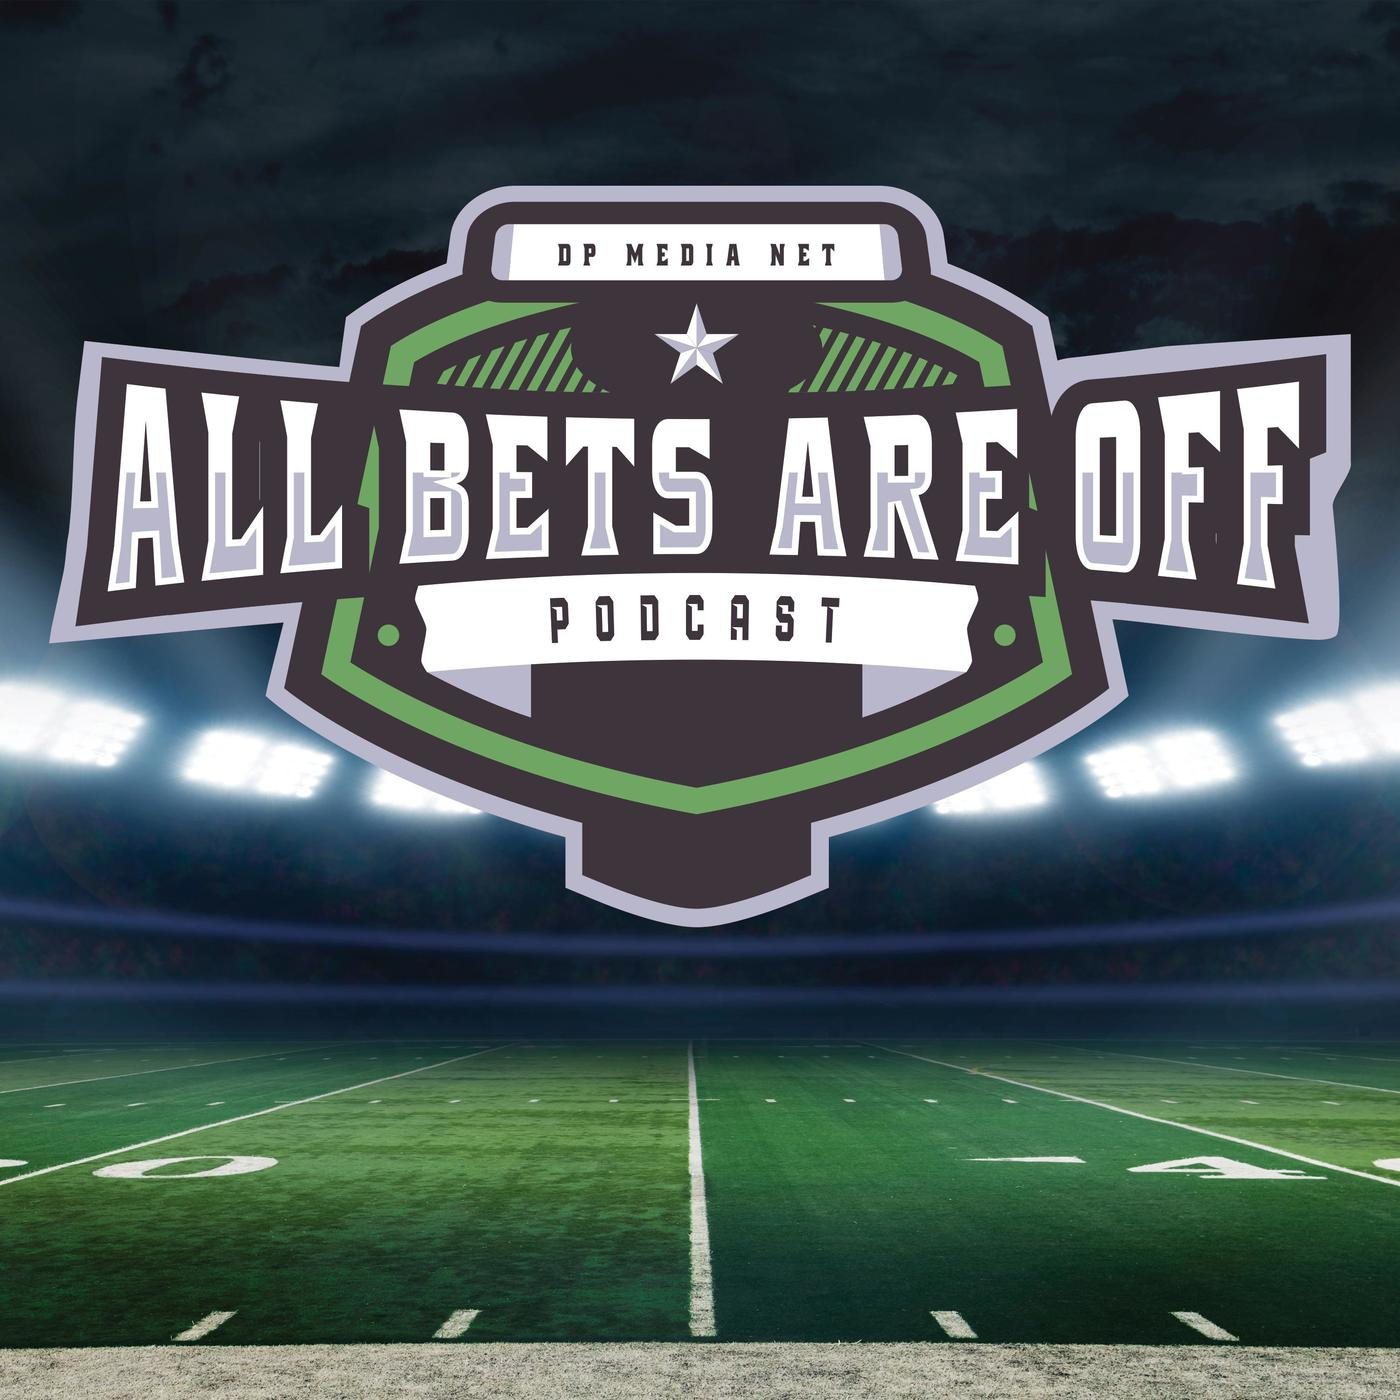 Nfl sports betting podcast cara memenangkan betting atlantica online database